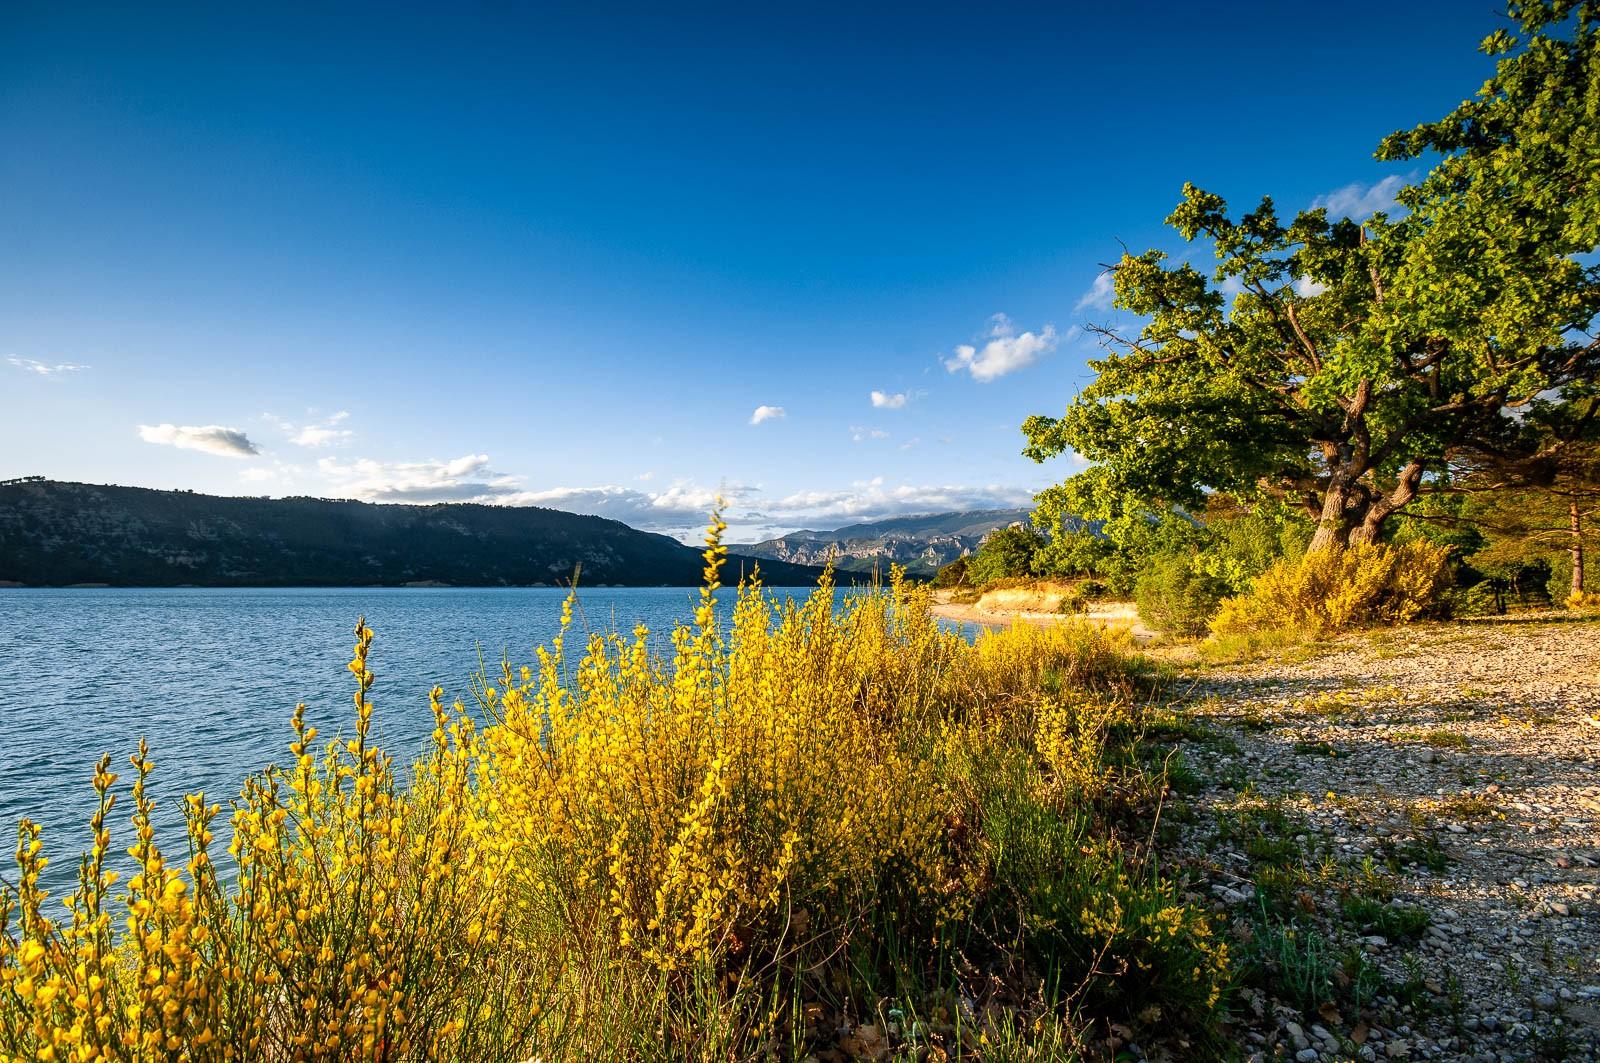 Lake St. Croix